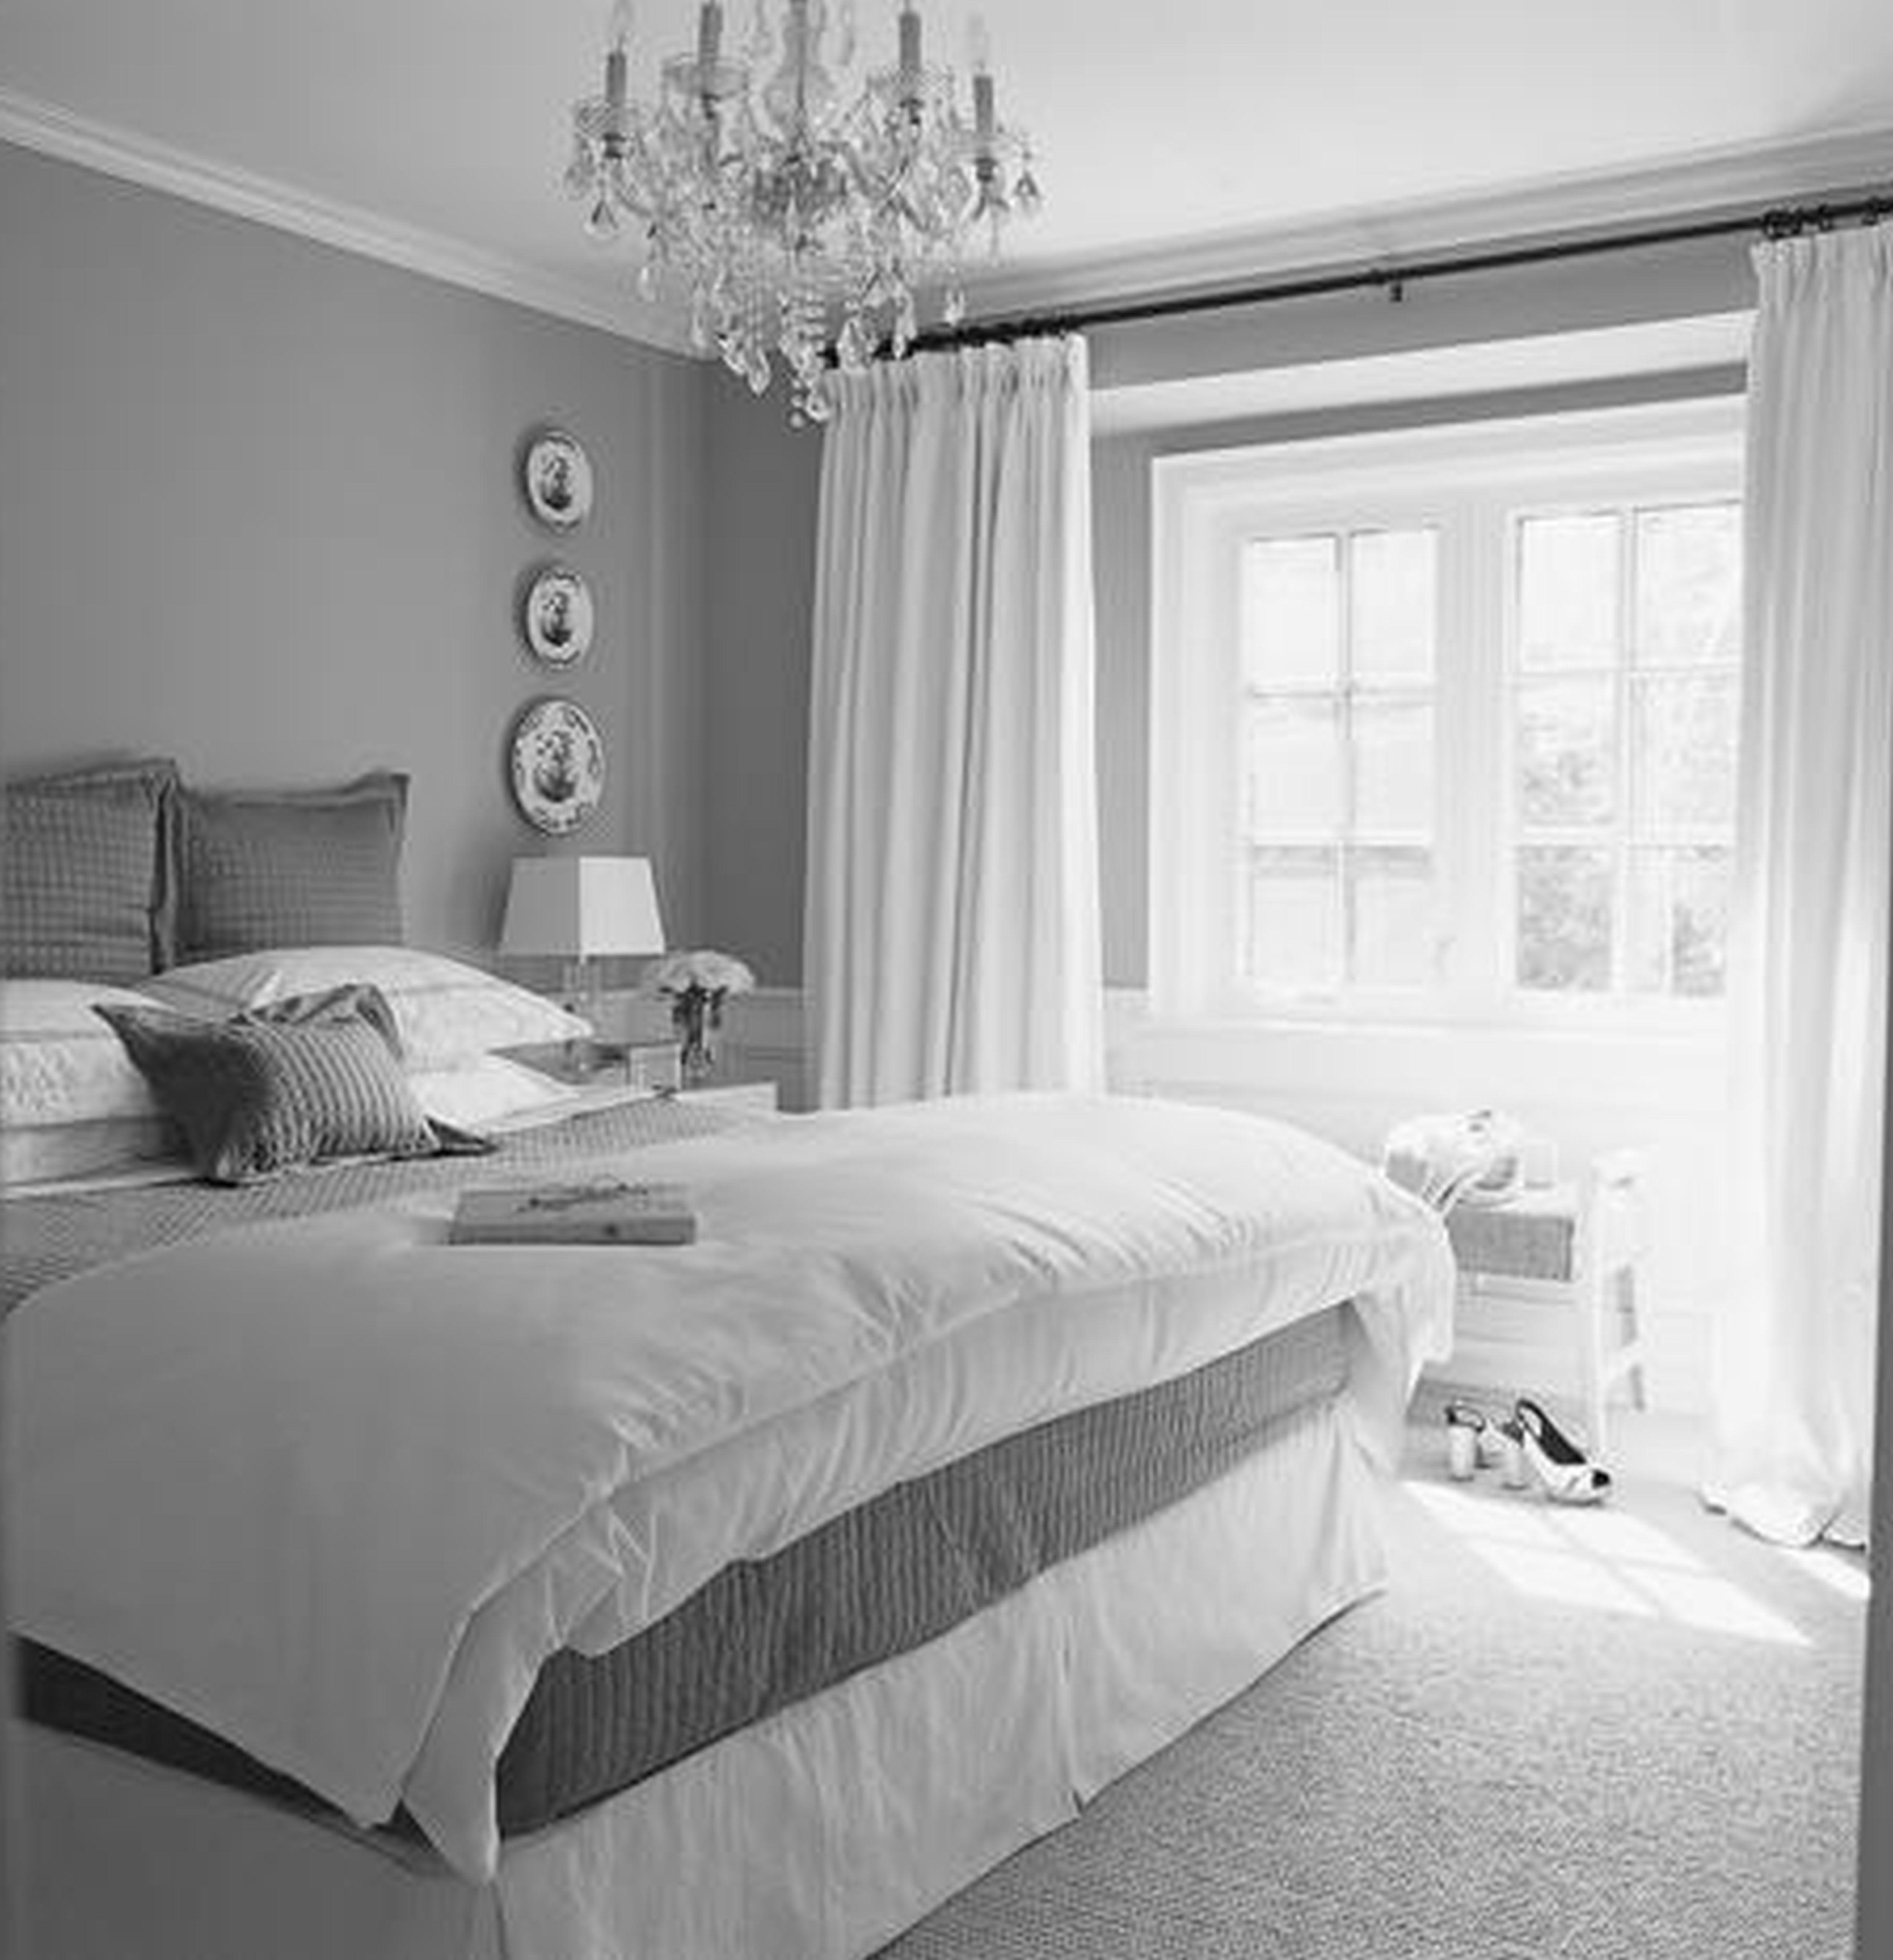 Master bedroom grey  master bedroom  For the Home  Pinterest  Master bedroom Bedrooms